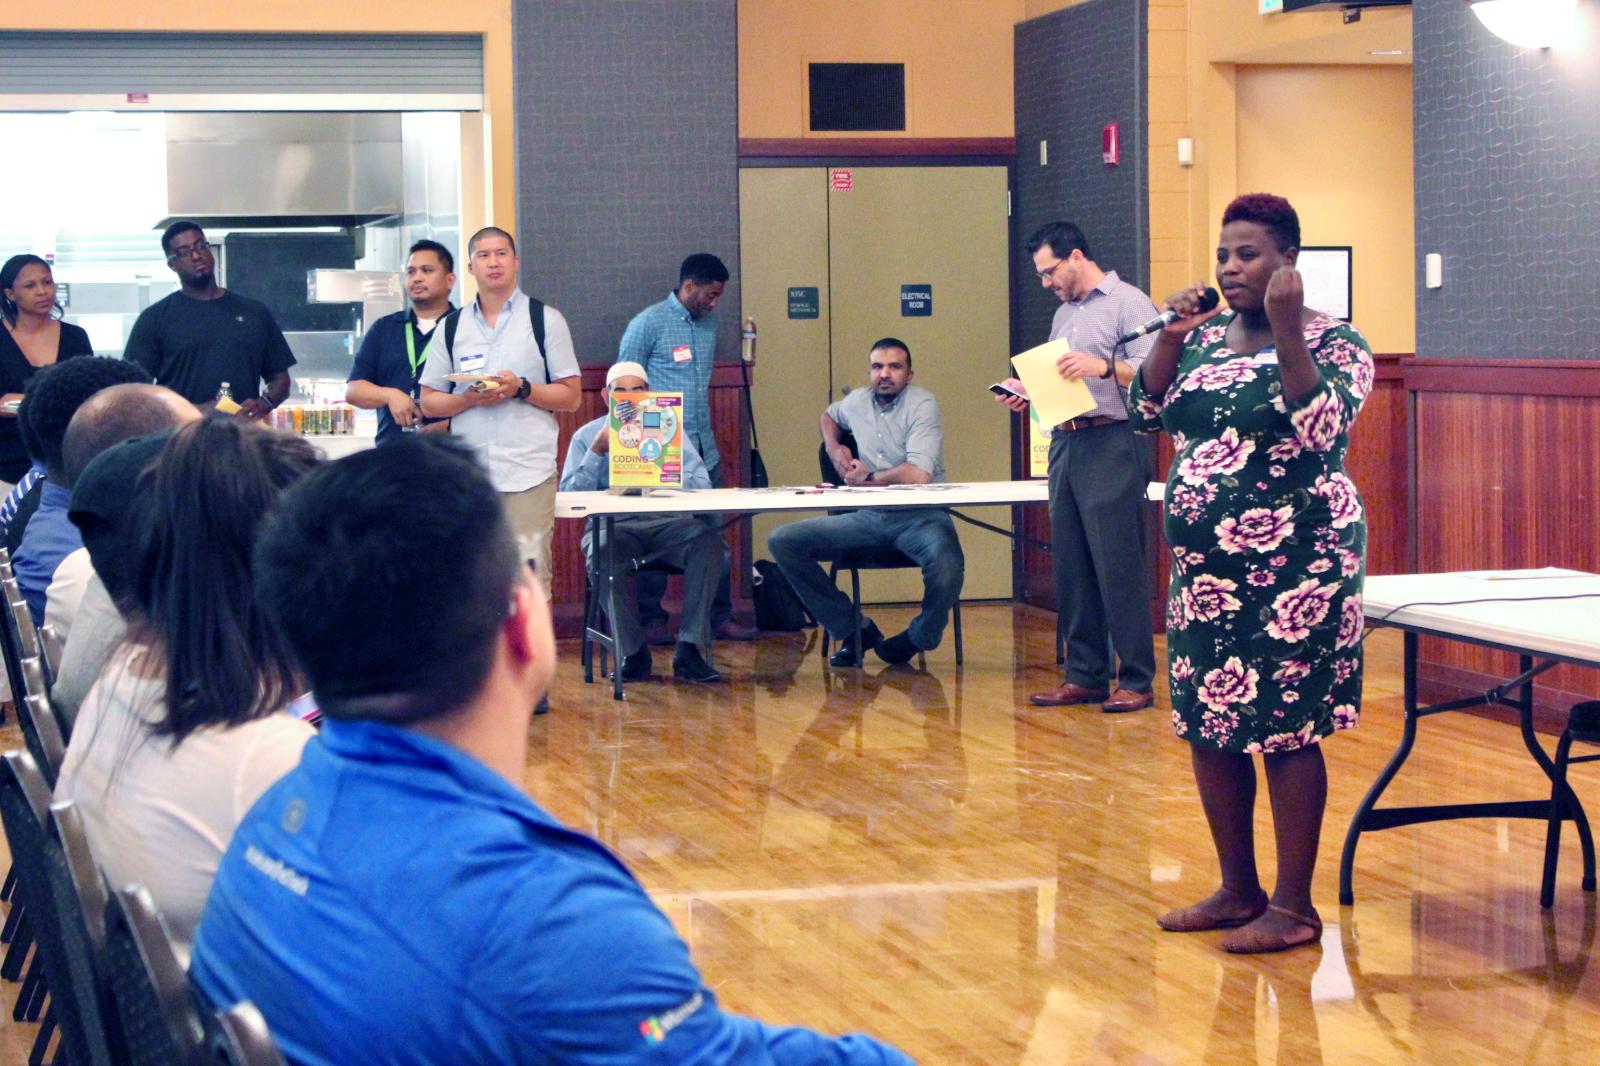 Shaunt'e Nance-Johnson shares her story in an inspiring welcome speech.